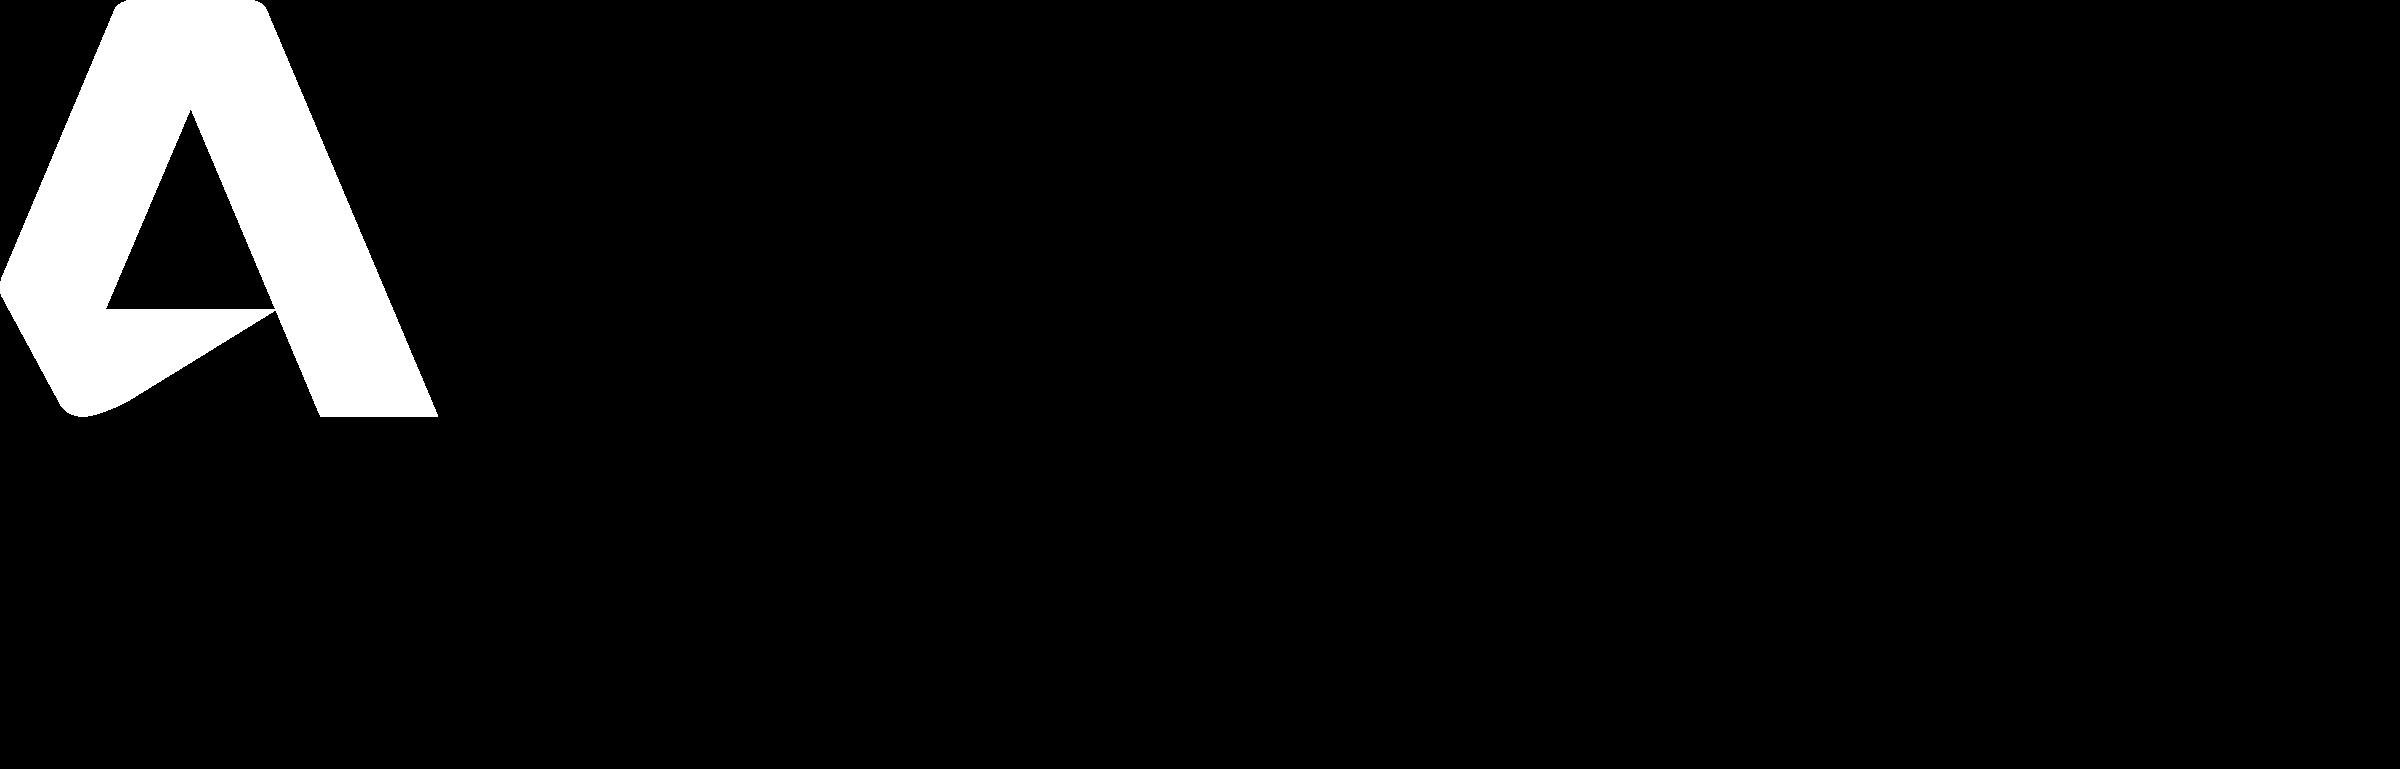 Autodesk Logo Png Transparent & Svg Vector - Pluspng Pluspng.com - Autodesk Logo PNG